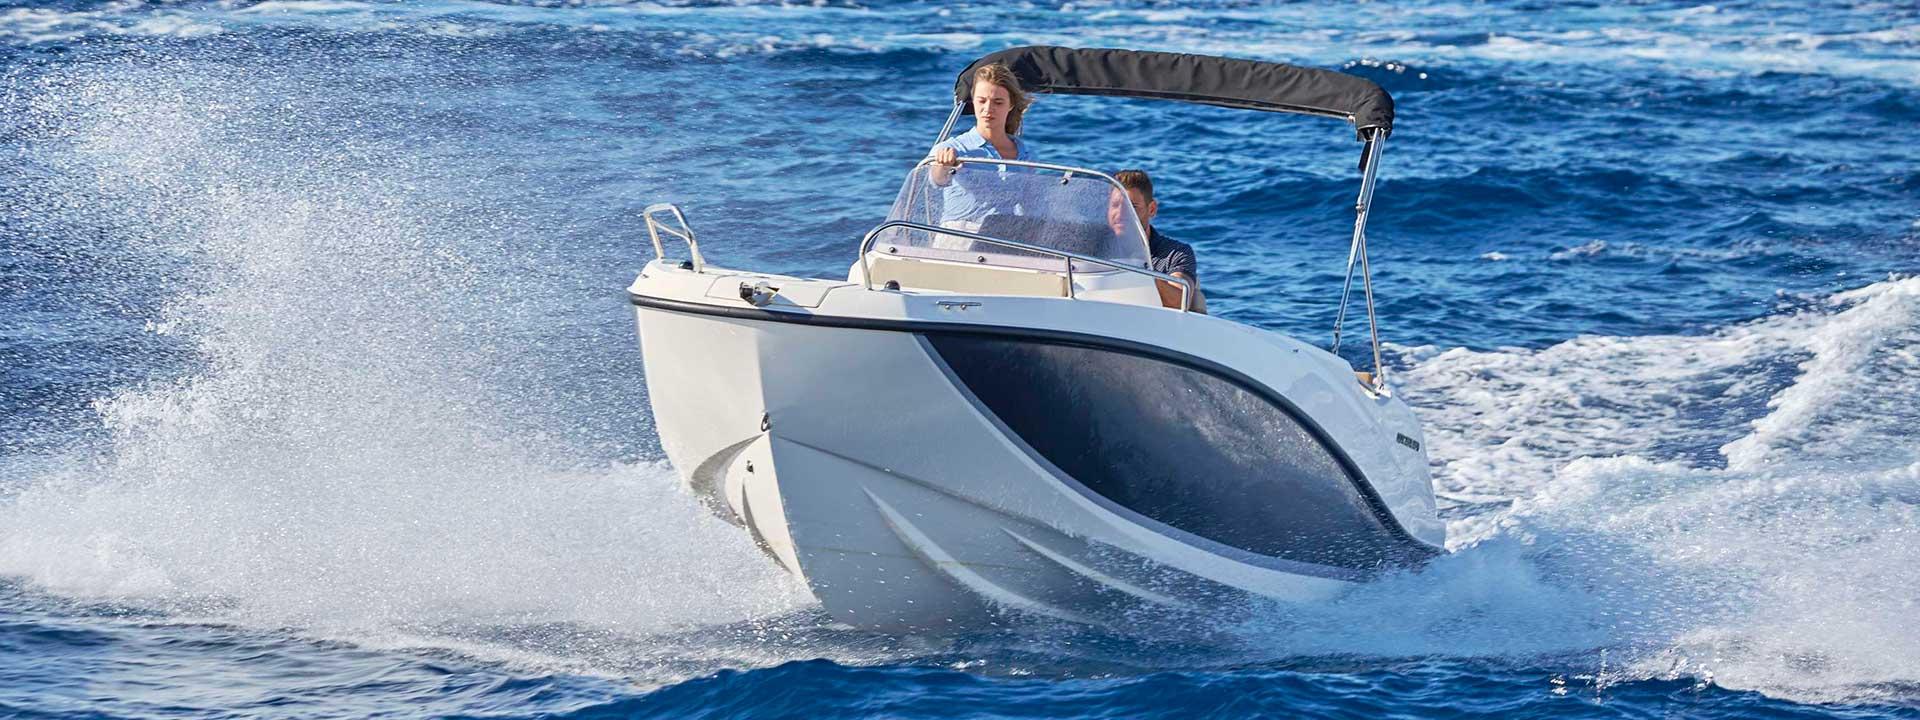 mayer-charter-boat-header-quicksilver-activ-555-open-04